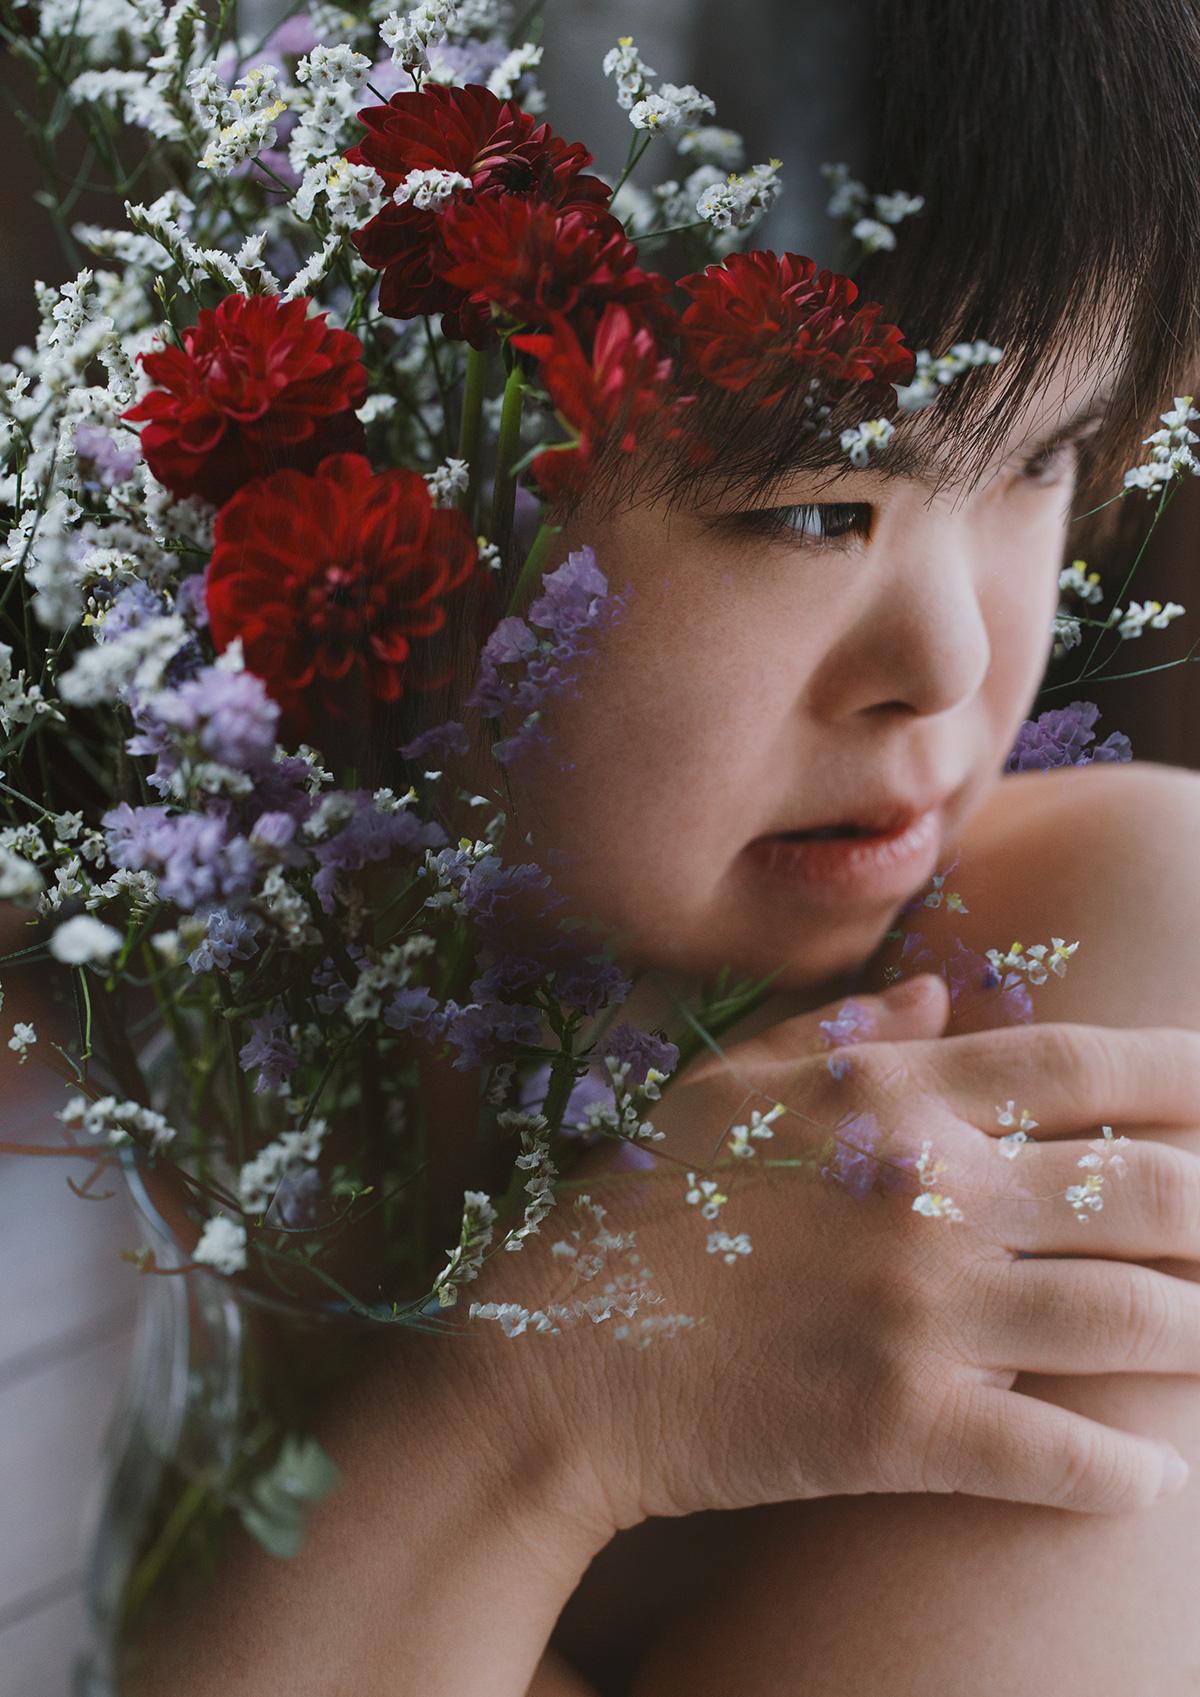 Hypnotic Double Exposure Portraits, Miki Takahashi | Yellowtrace